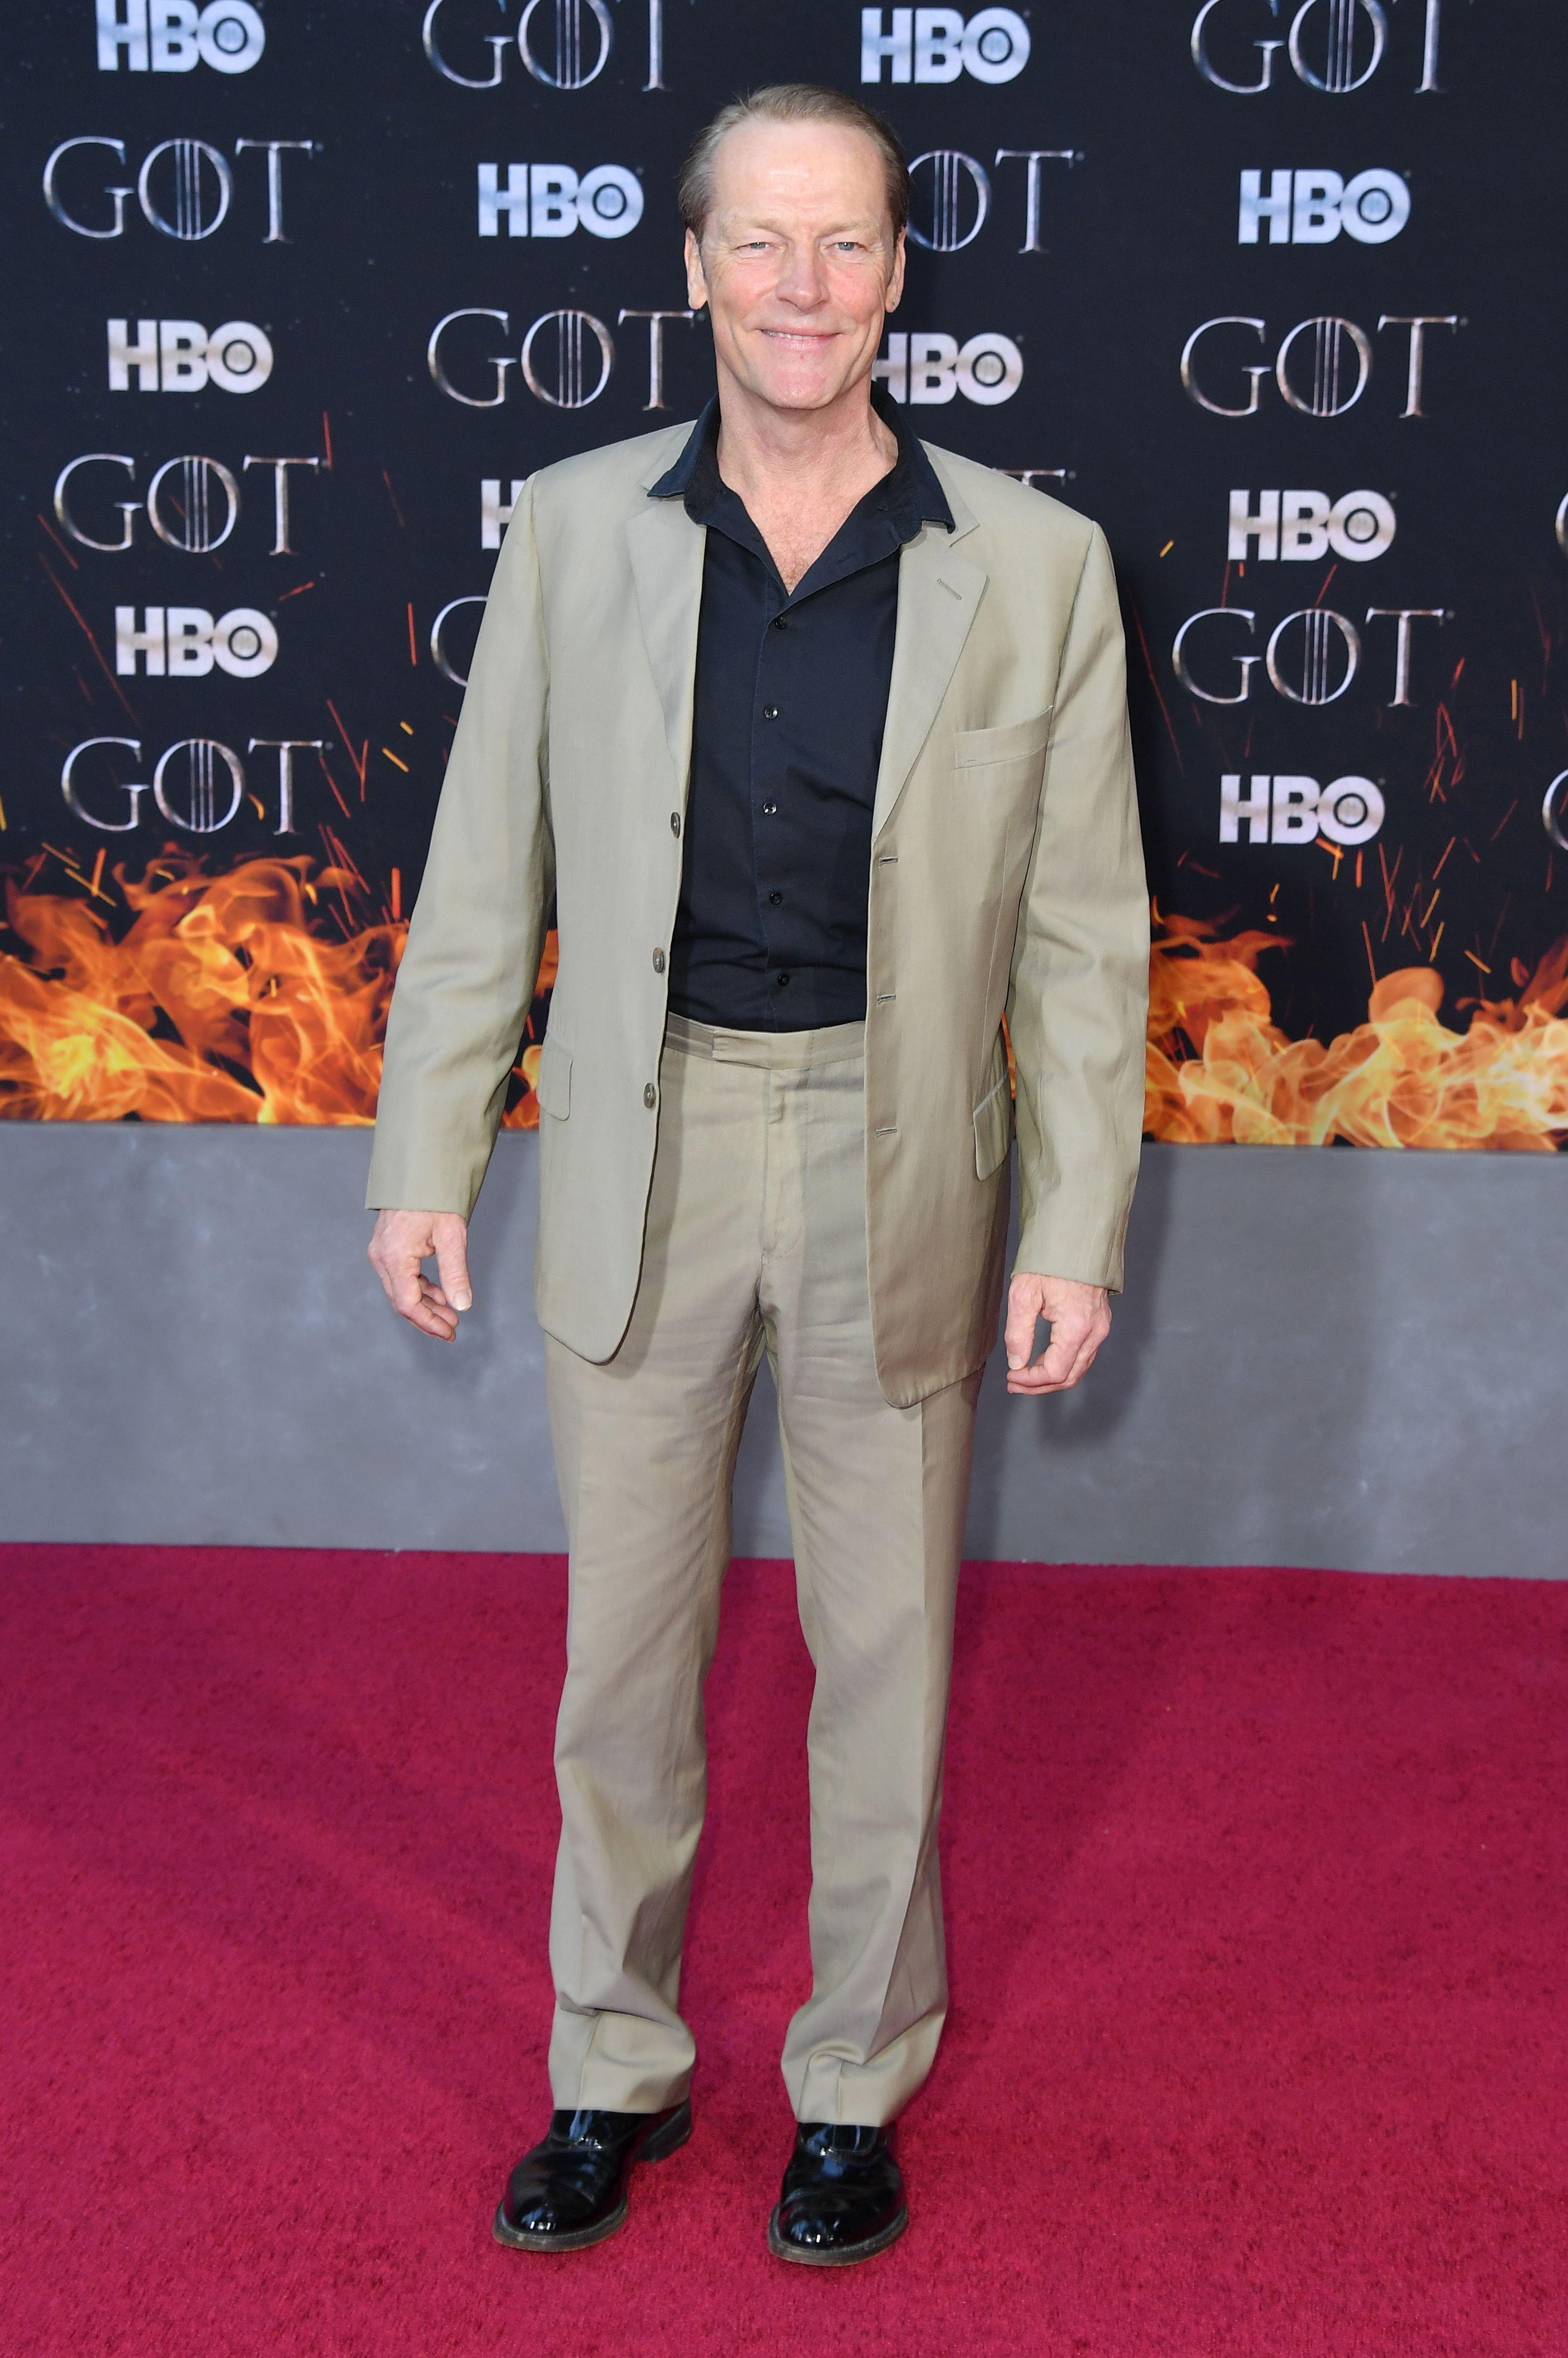 Iain Glen (Jorah Mormont